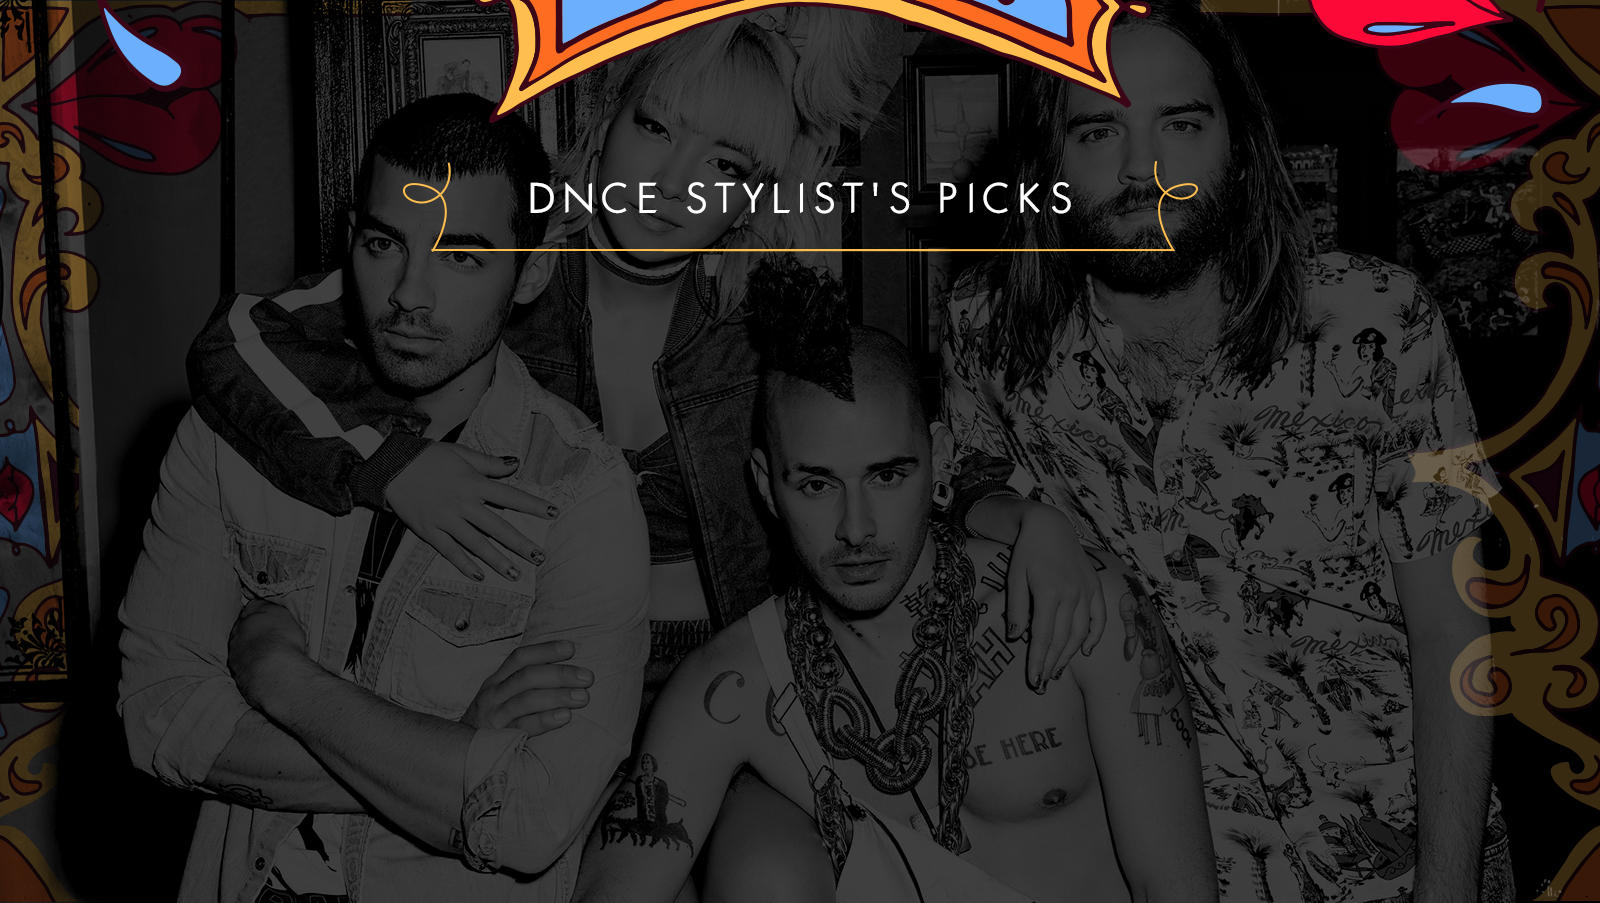 Shop DNCE Stylist's Picks